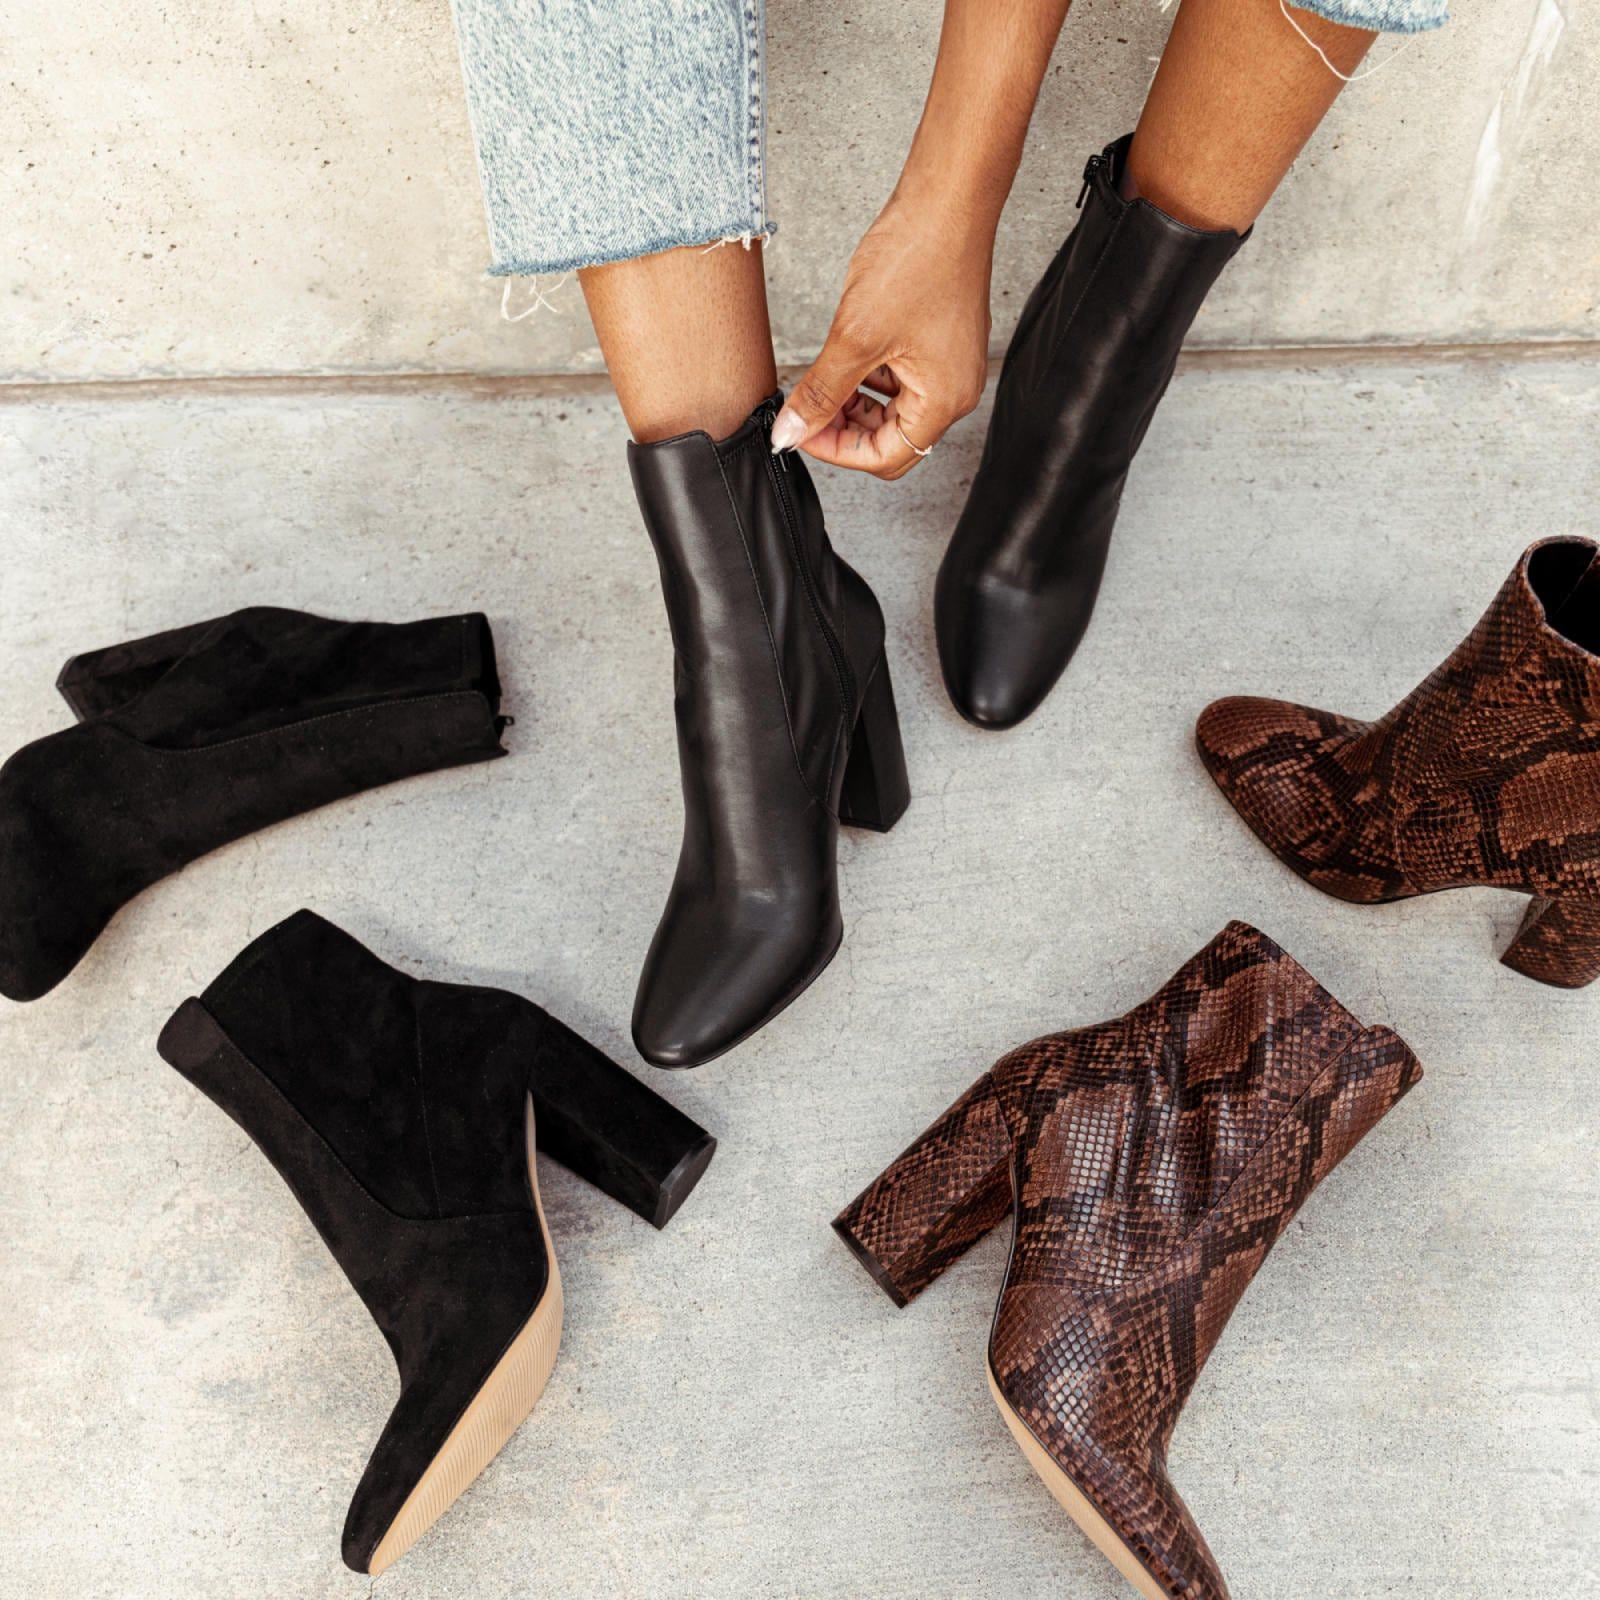 Aurella Black Synthetic Smooth Women S Boots Aldo Us Boots Dress Boots Women Trendy Block Heels